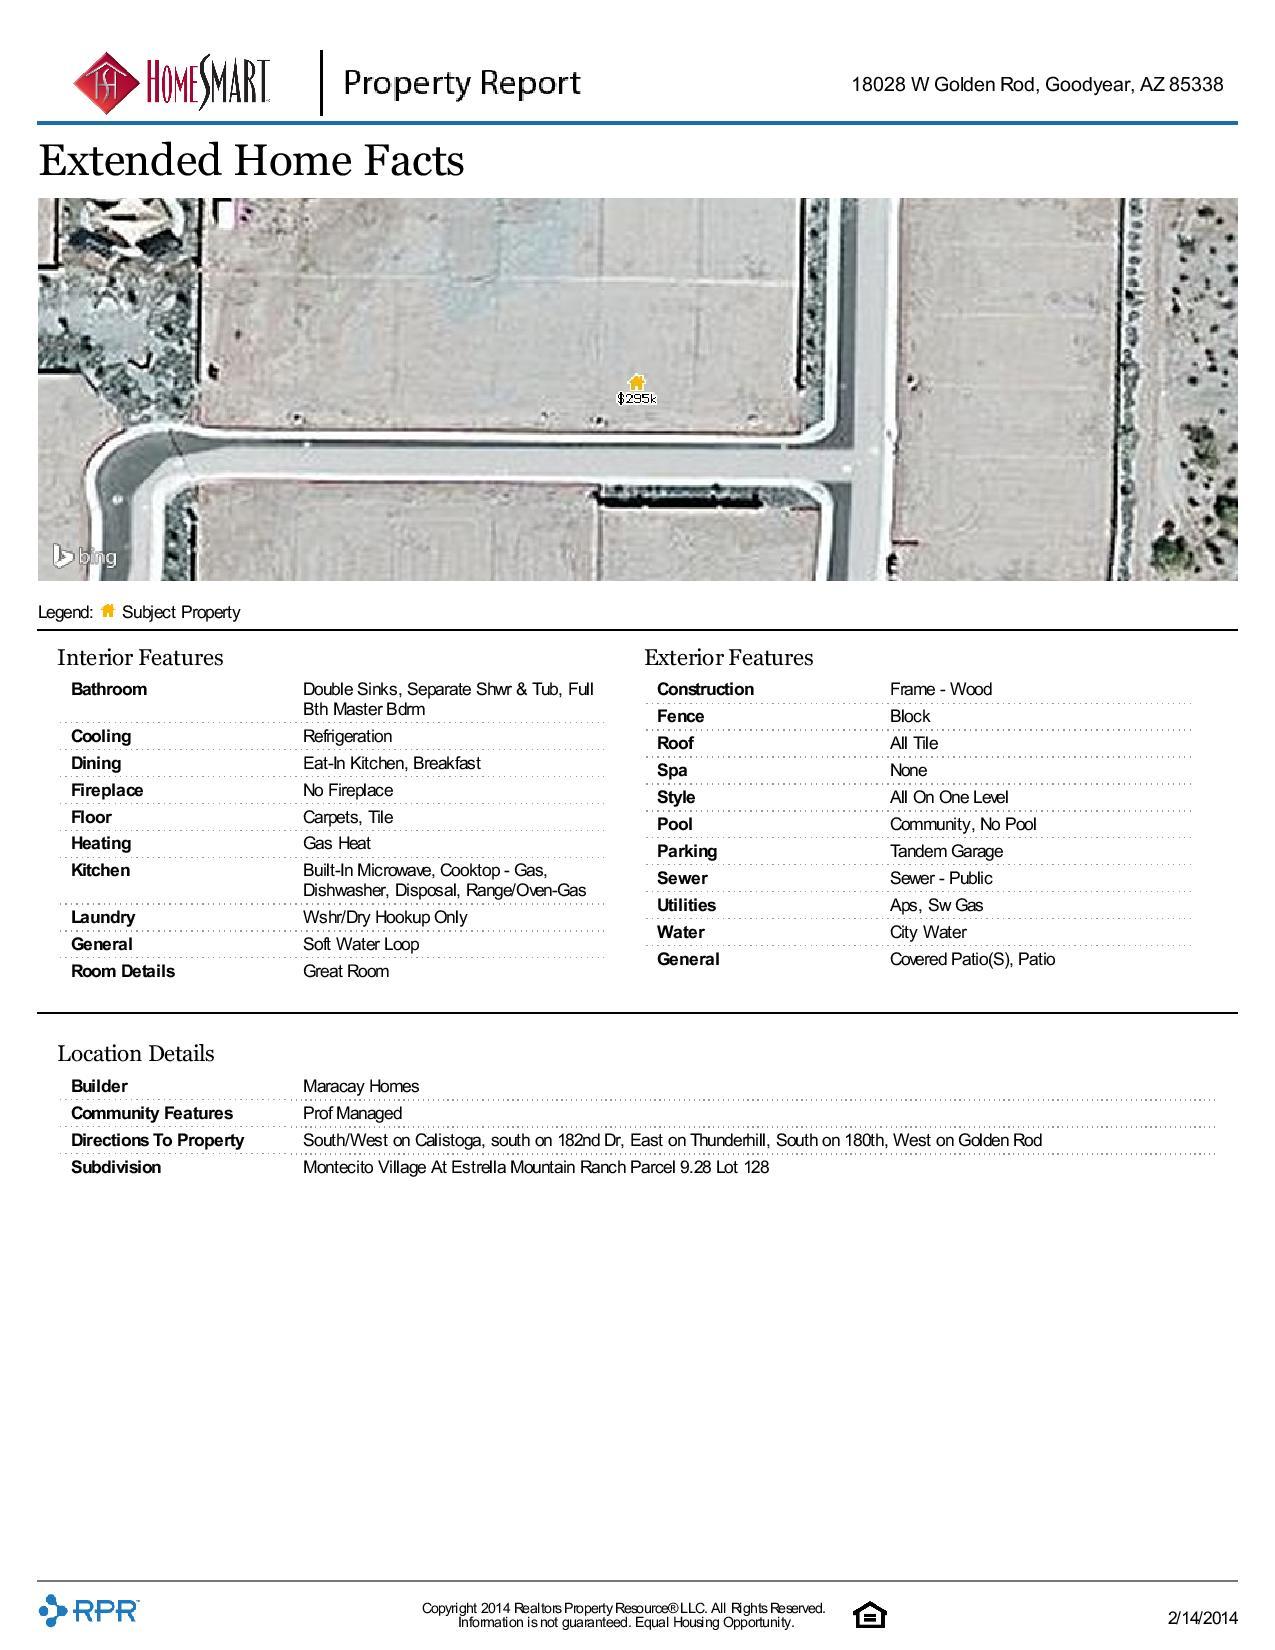 18028-W-Golden-Rod-Goodyear-AZ-85338-page-004